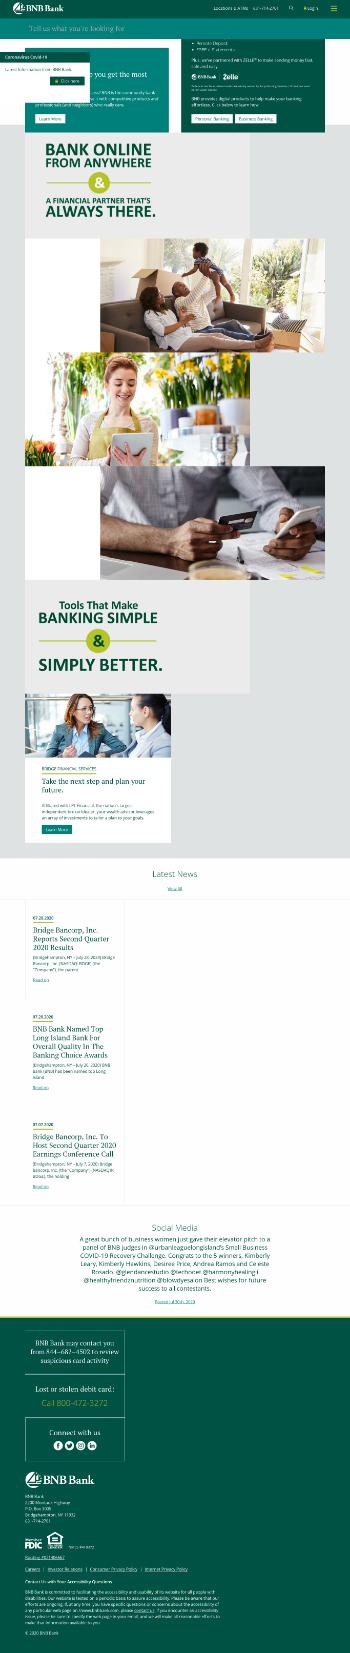 Bridge Bancorp, Inc. Website Screenshot